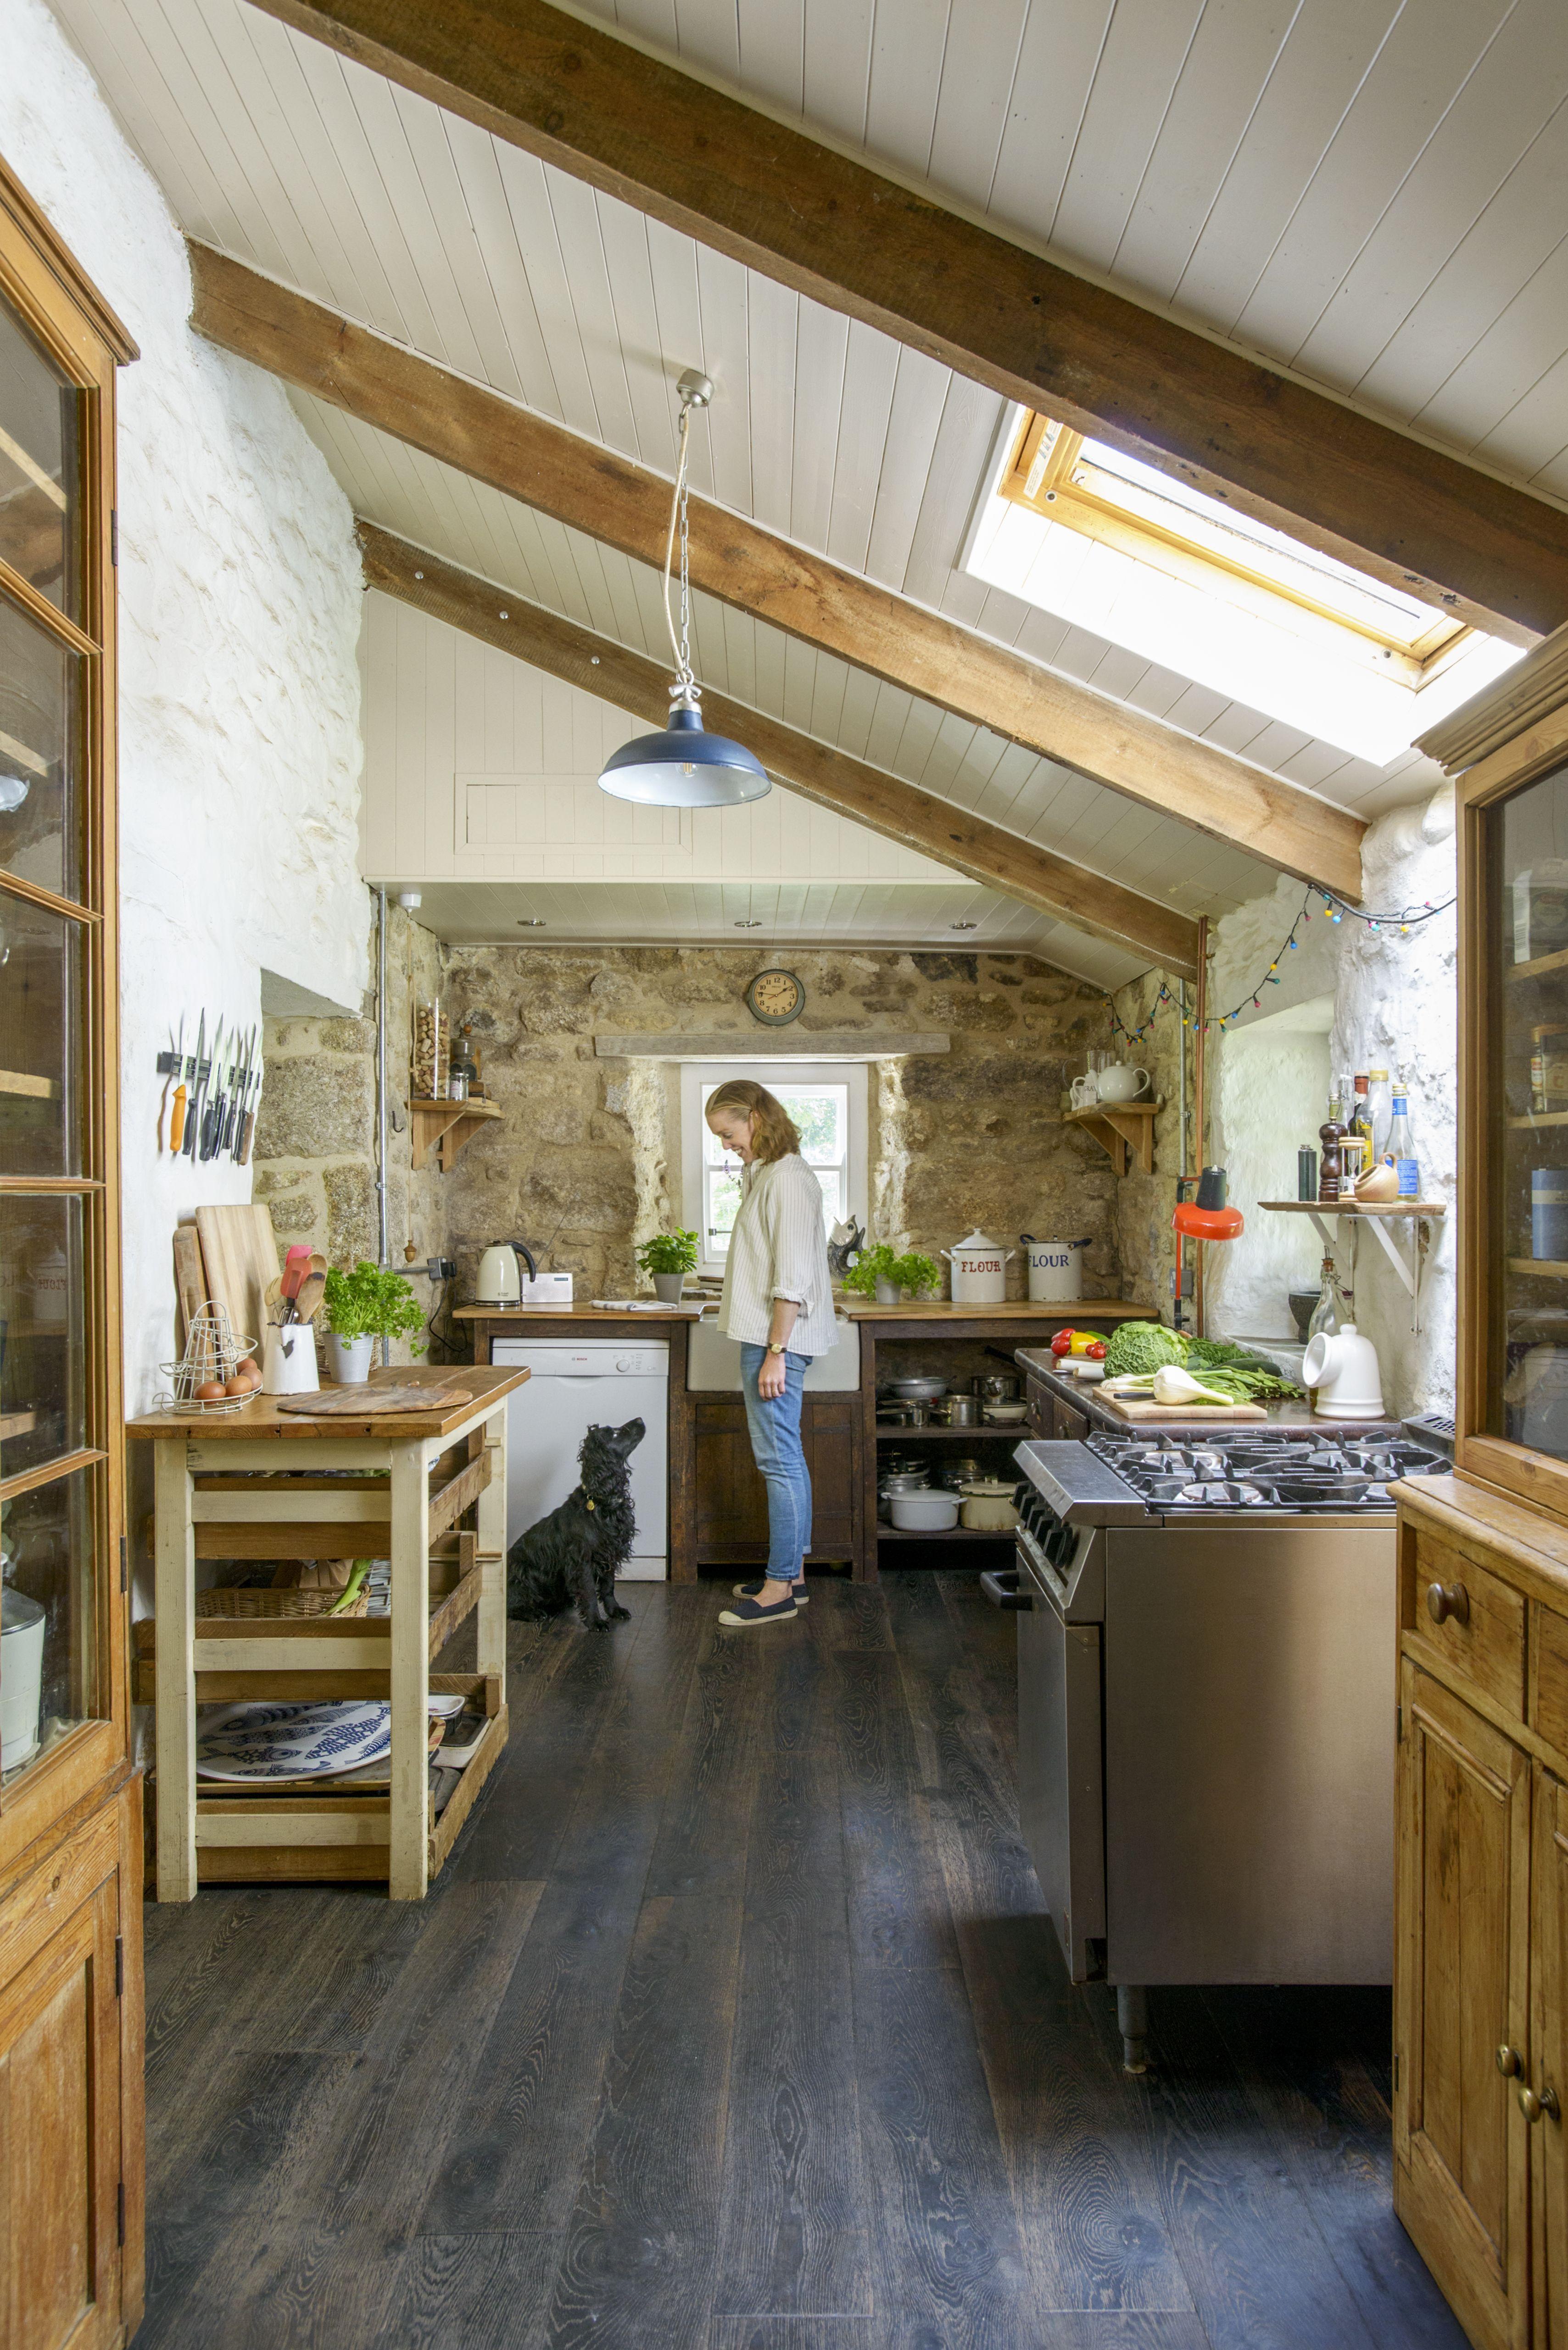 Freestanding kitchens: 14 flexible ideas